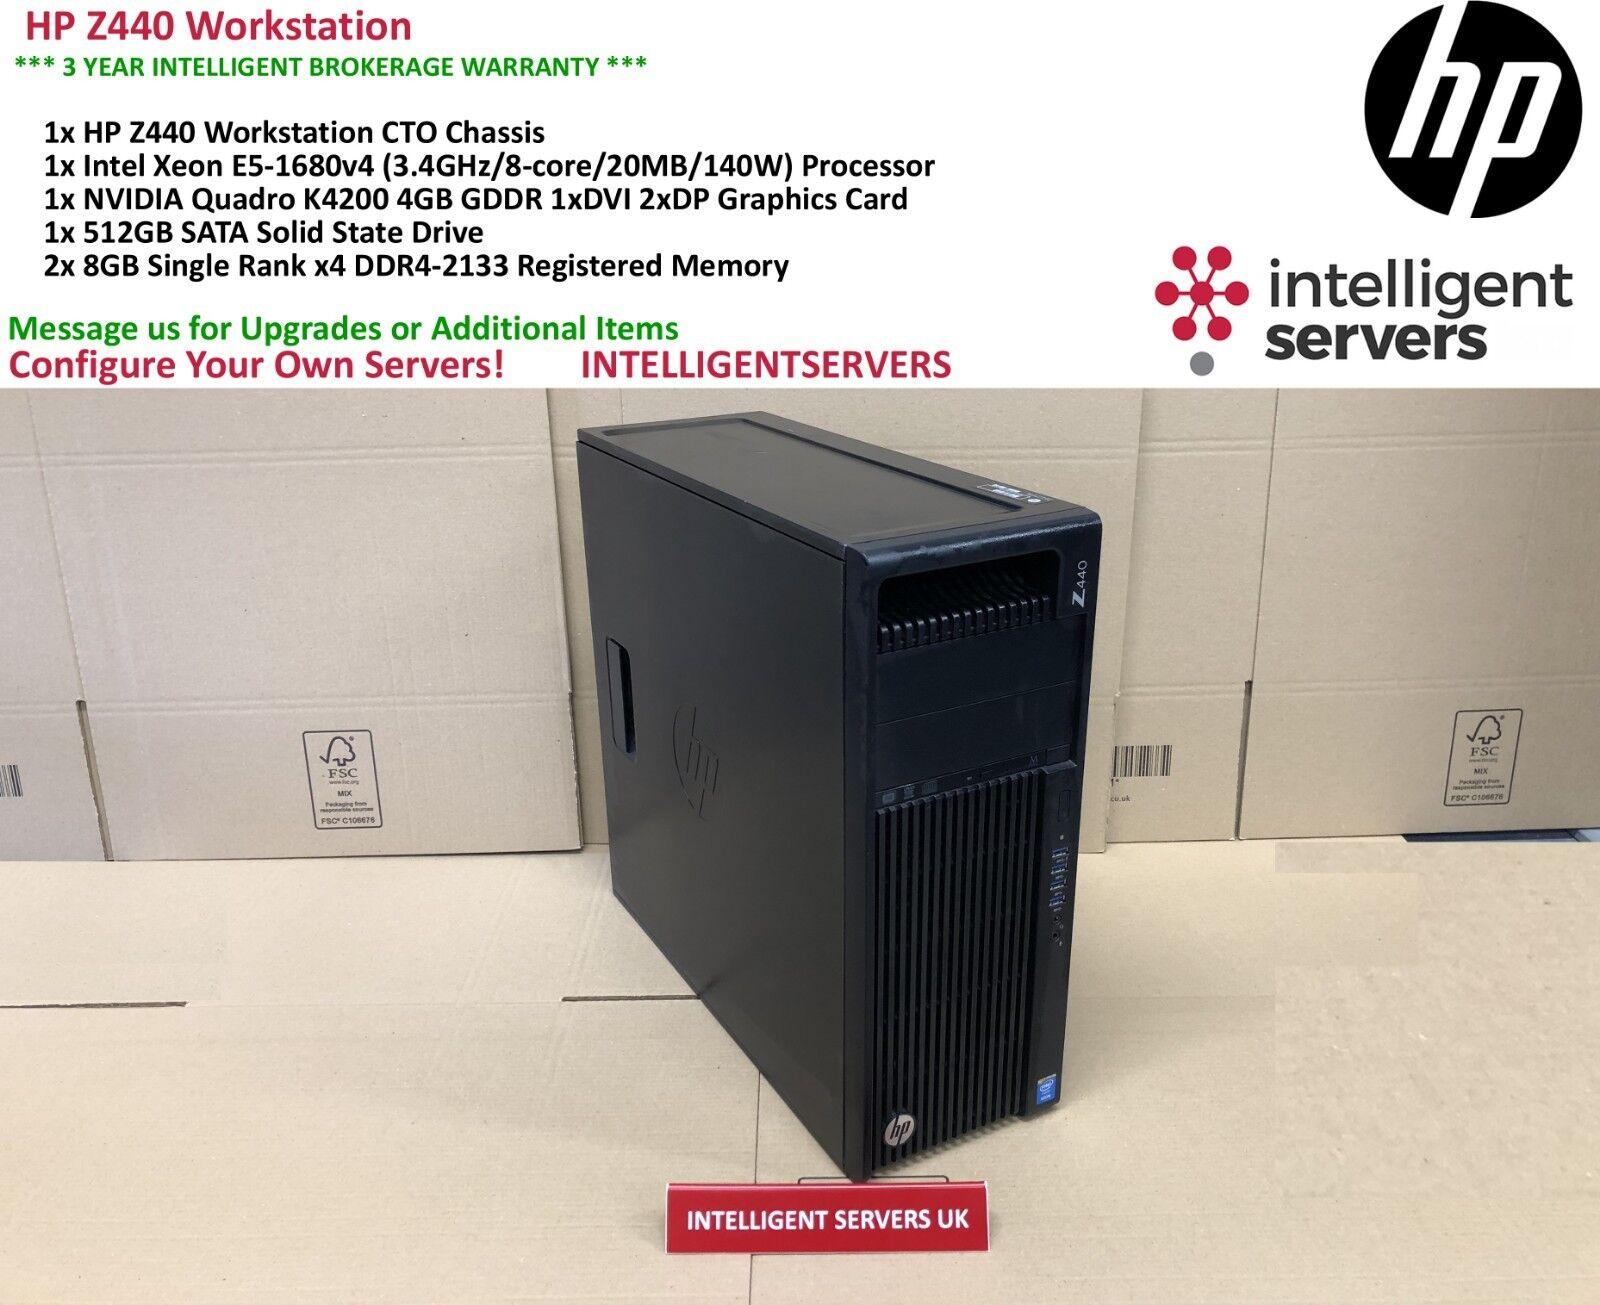 Details about HP Z440 Workstation, Intel Xeon E5-1680 V4, 16GB DDR4, 512GB  SSD, Quadro K4200